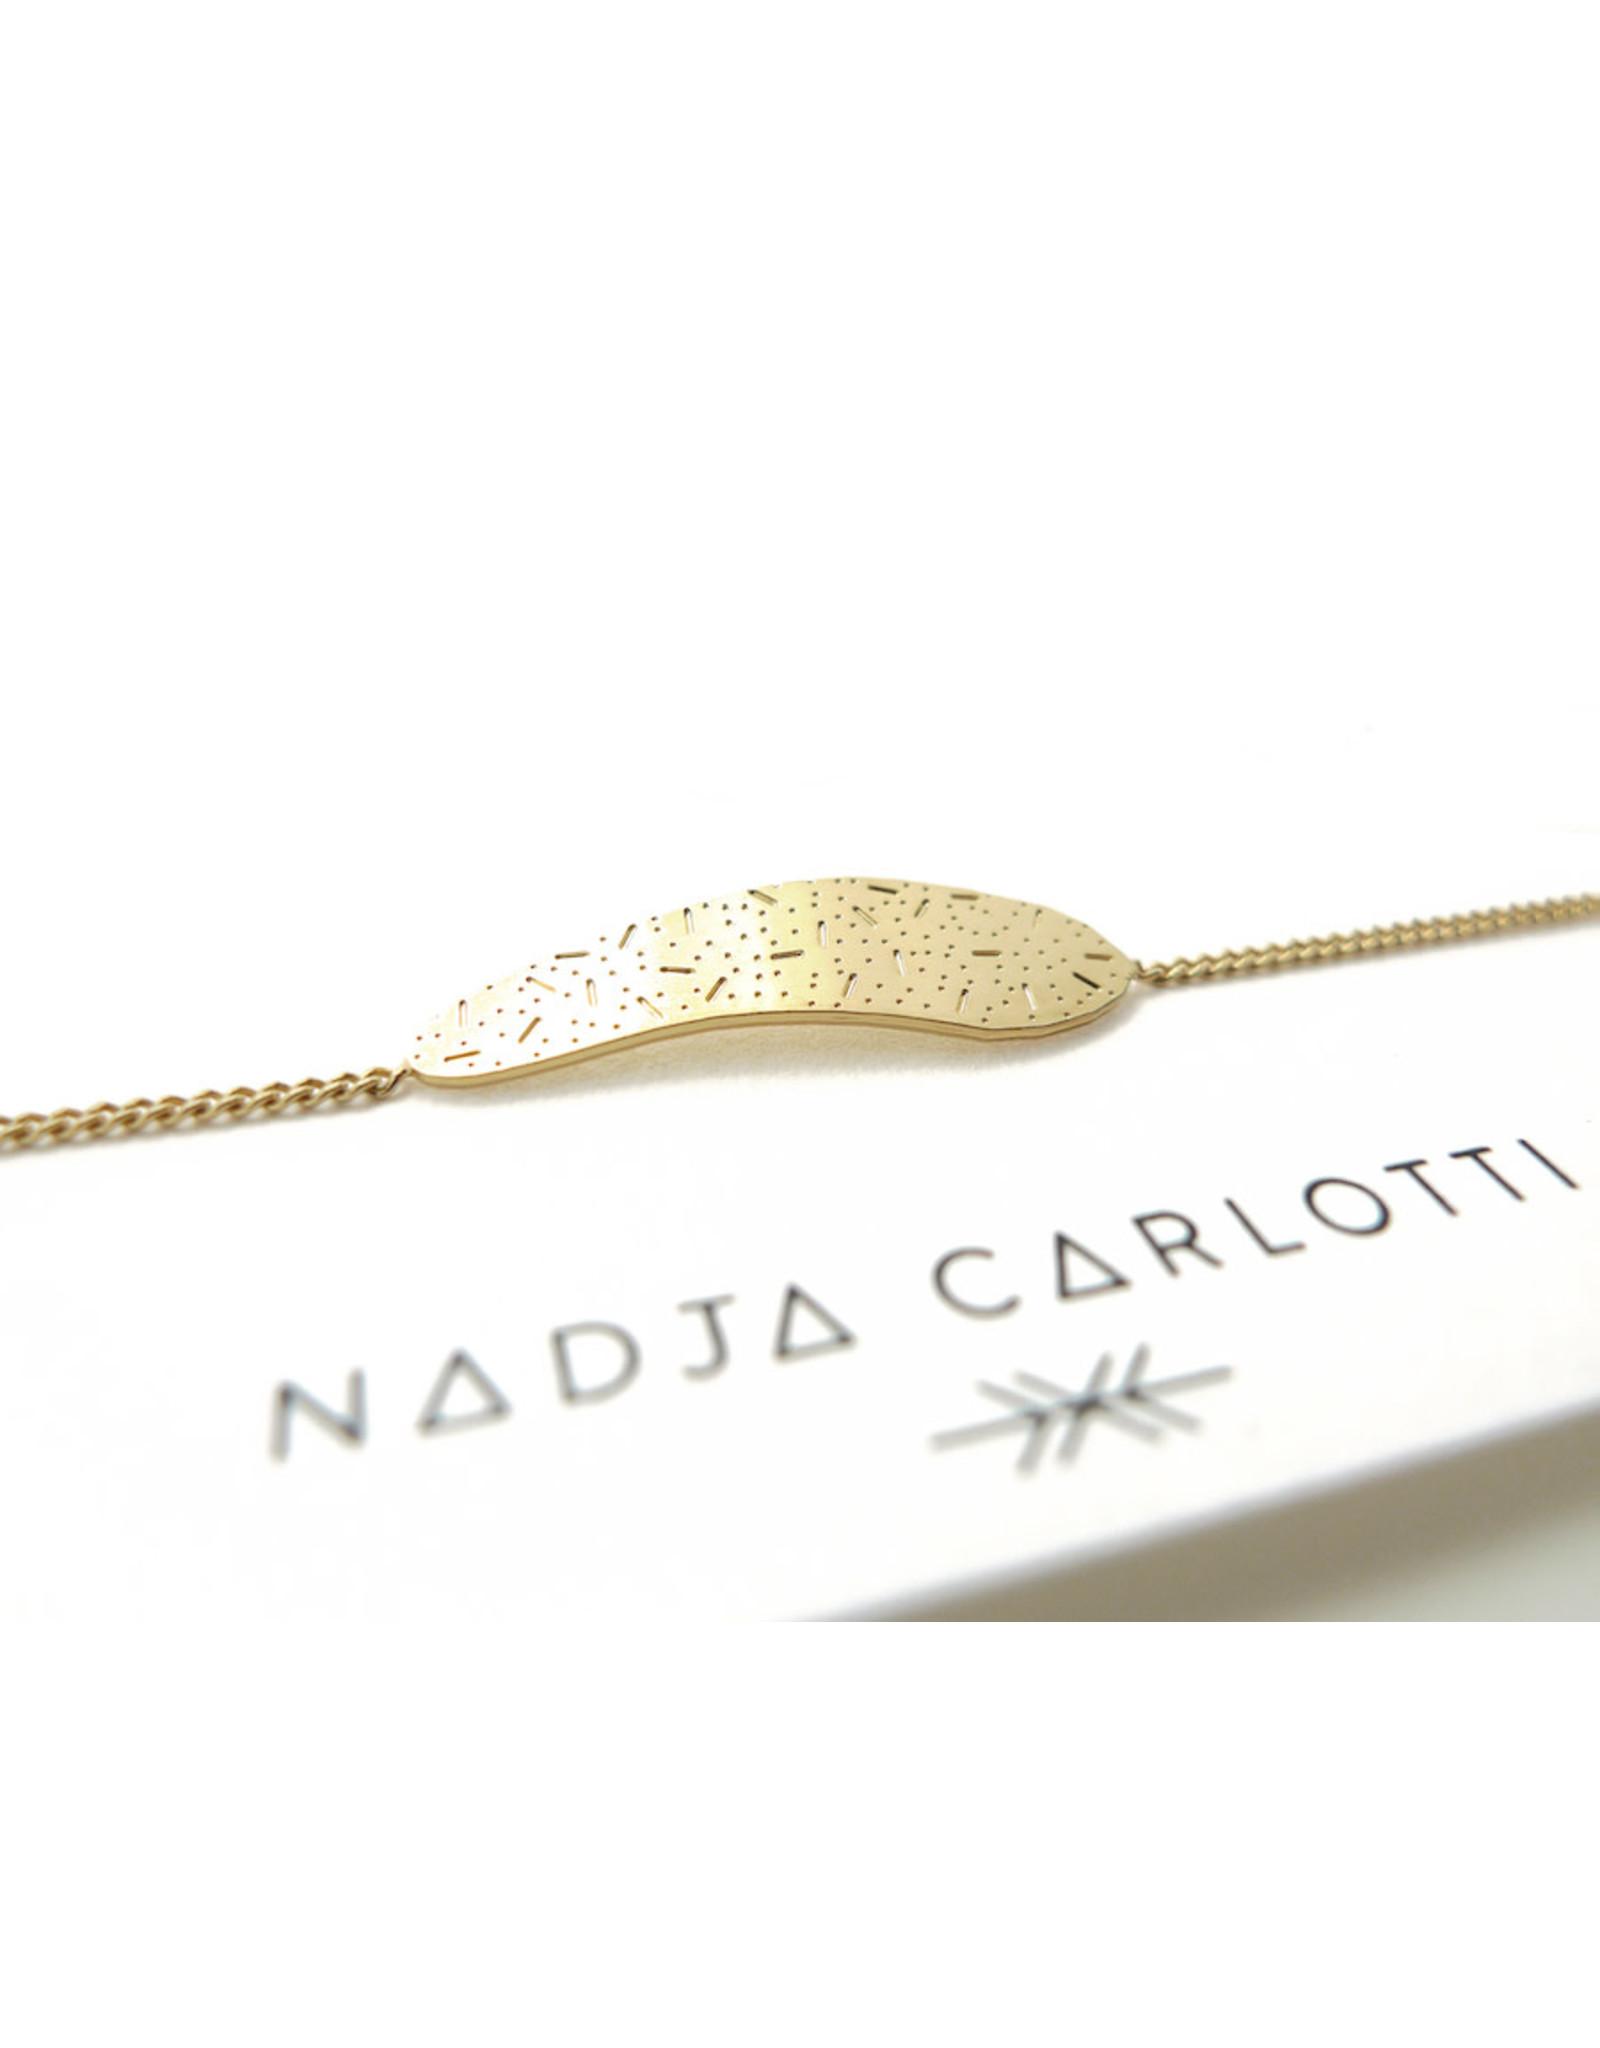 Nadja Carlotti Armband Sédiment  - Messing verguld  - Lengt 16 cm + 2 cm - Patroon B 2,9 x H 0,7 cm